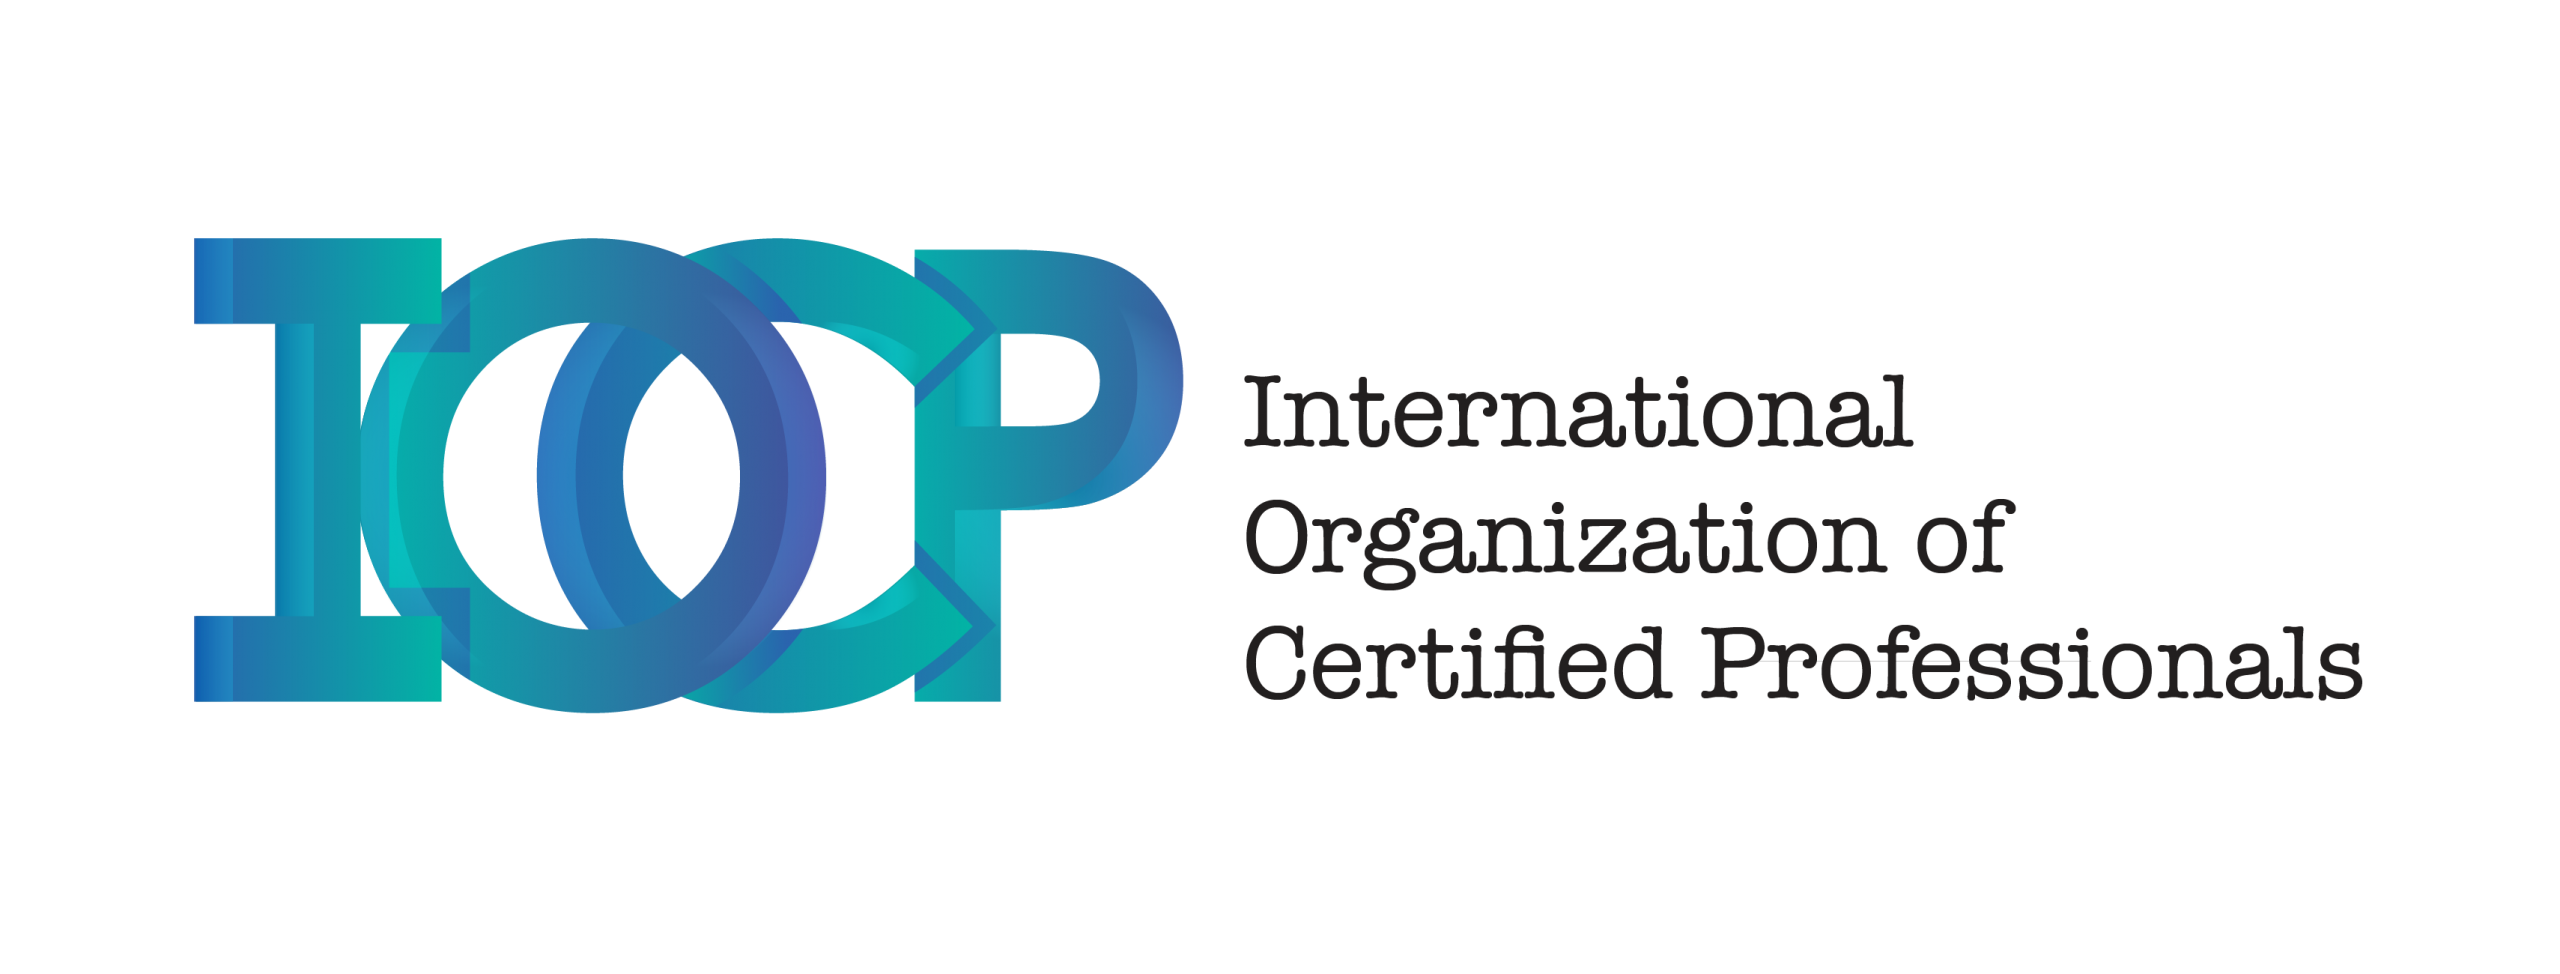 International Organization of Certified Professionals